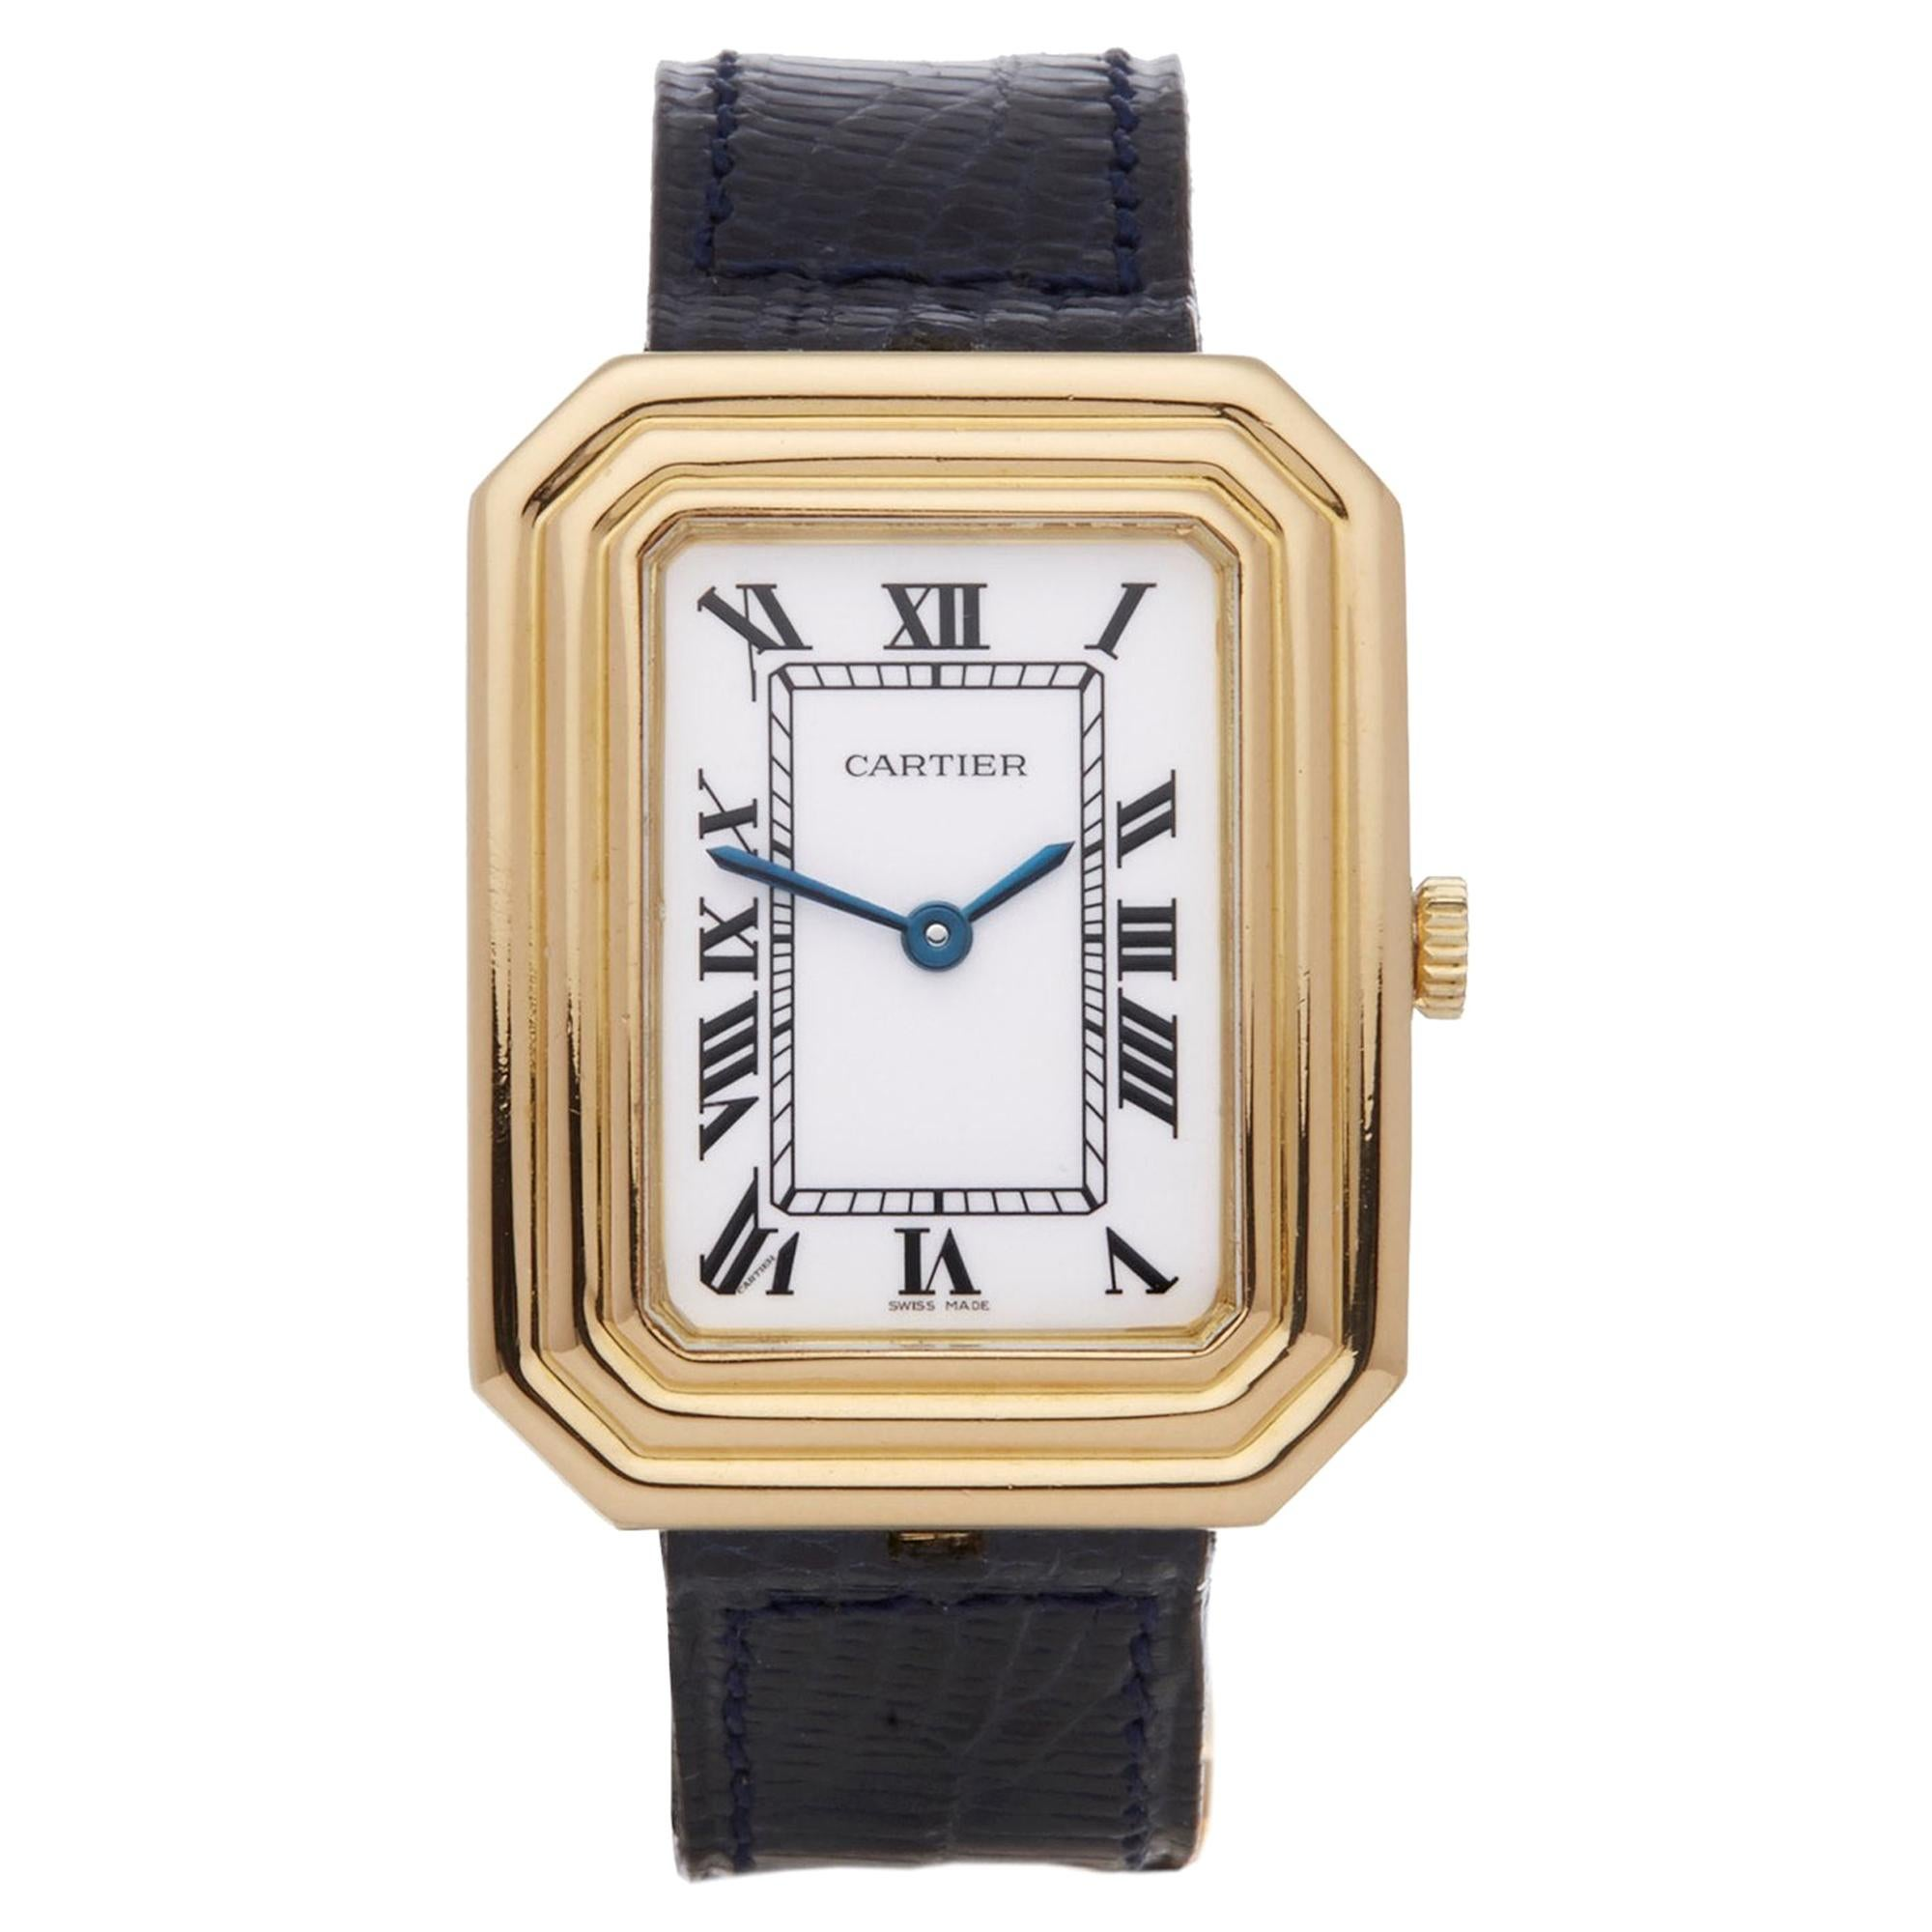 Cartier Cristallor Paris Ladies Yellow Gold Enamel Dial Watch